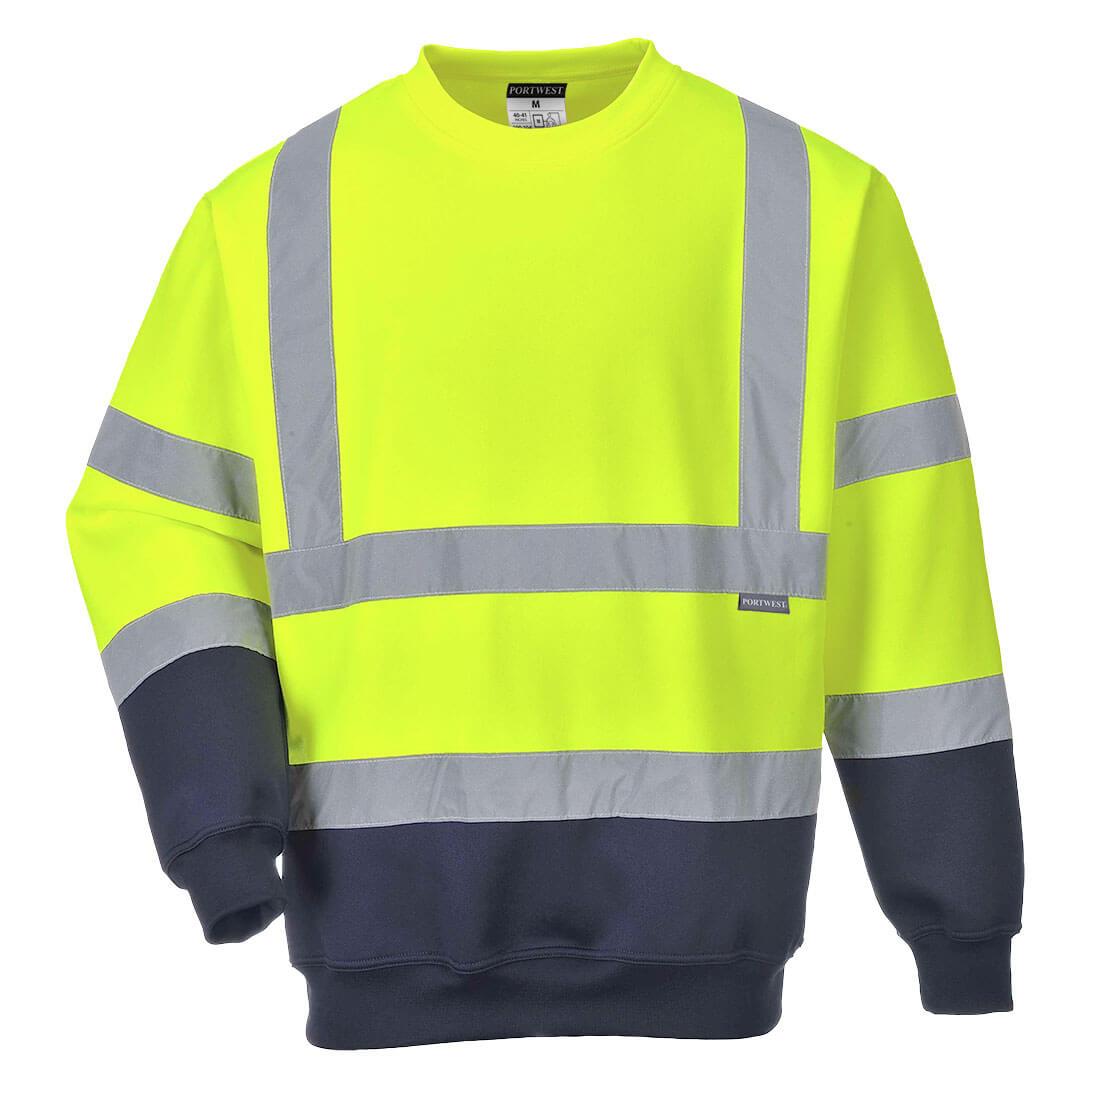 Hi-Vis 2-Tone Sweatshirt Yellow/Navy 3XLR